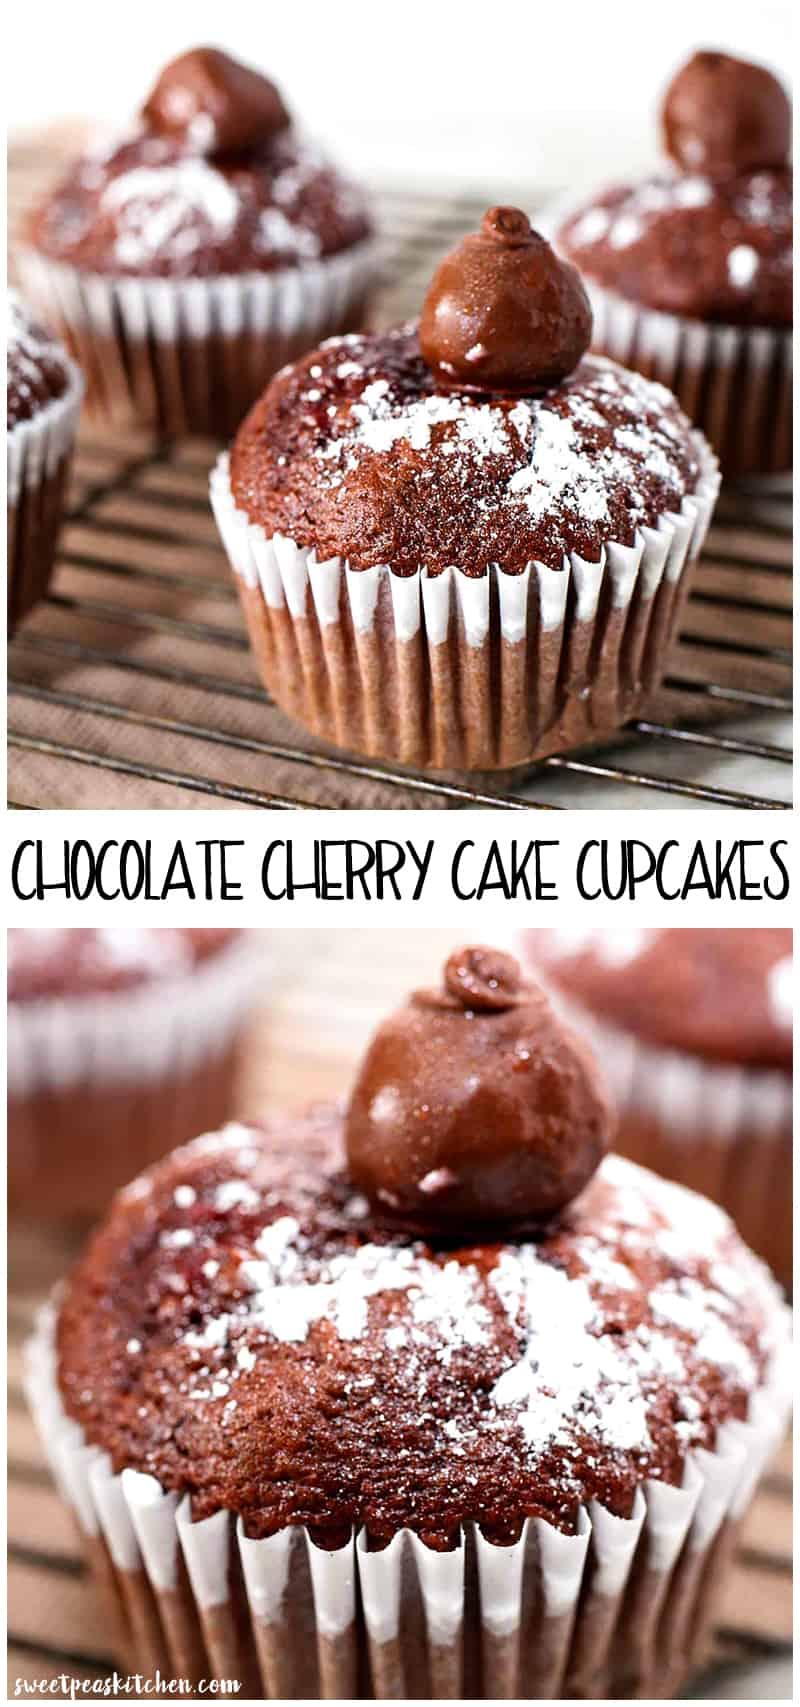 Chocolate Cherry Cake Cupcakes